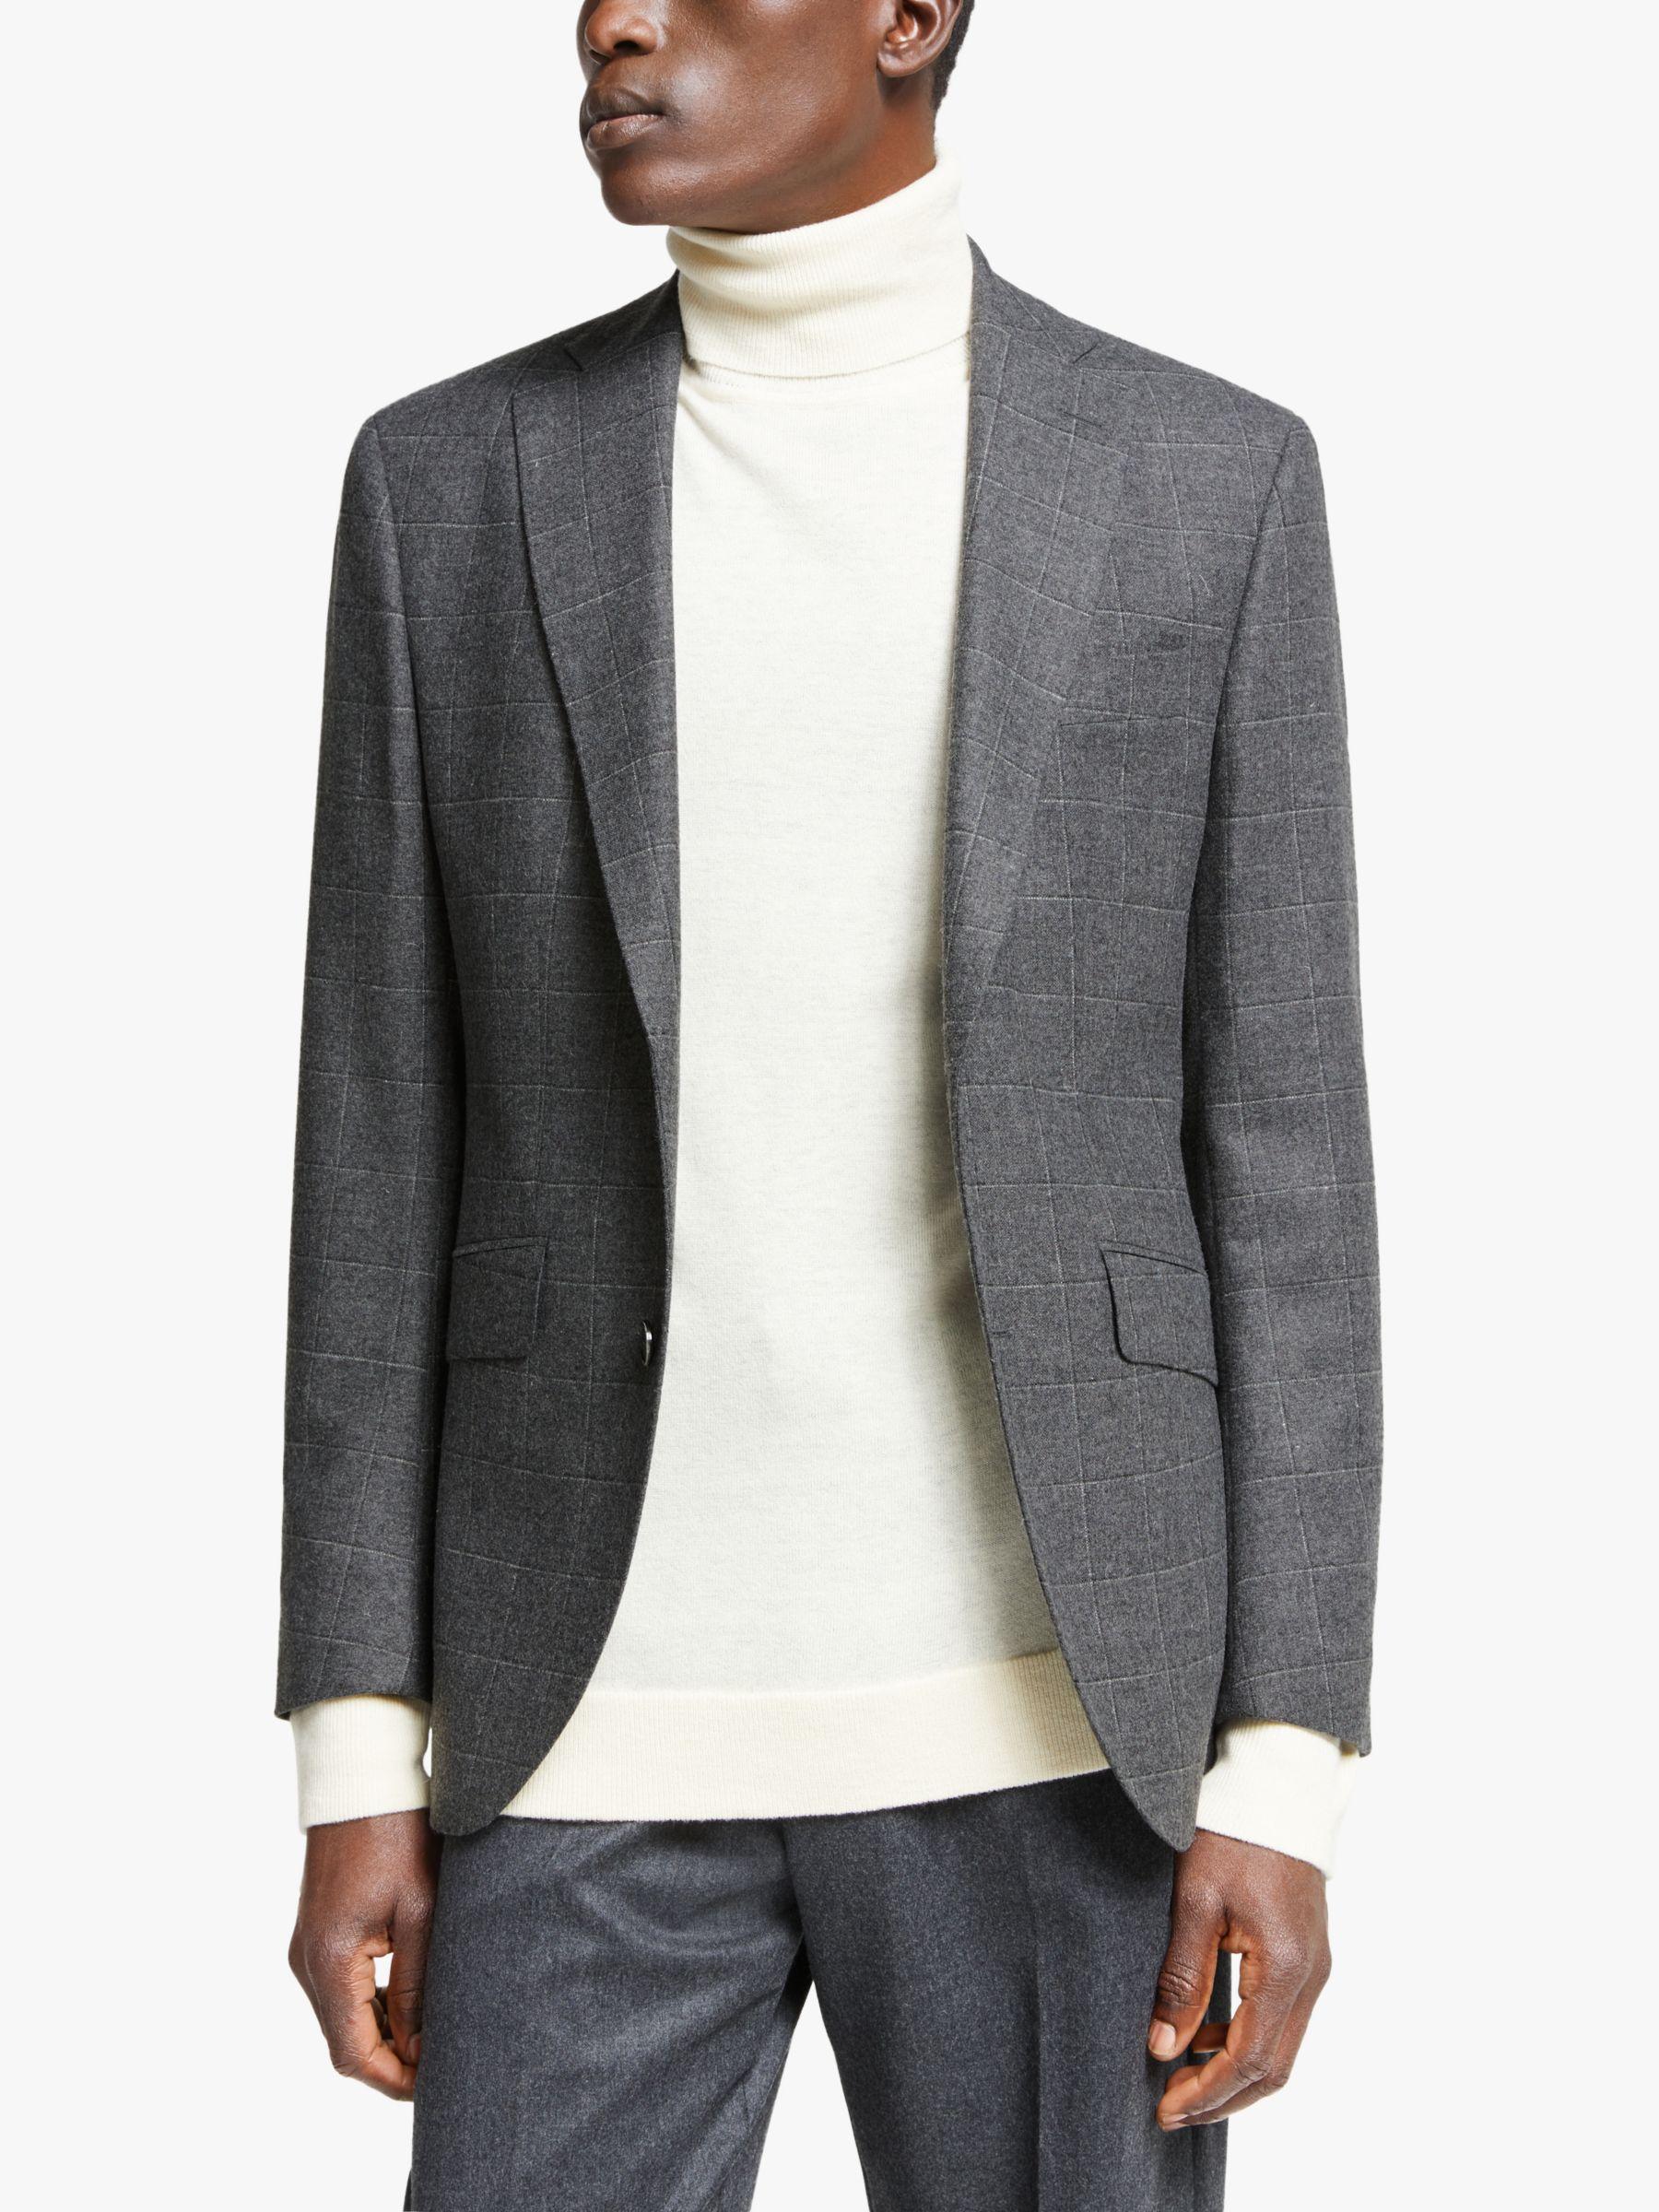 Hackett London Hackett London Windowpane Check Tailored Suit Jacket, Grey